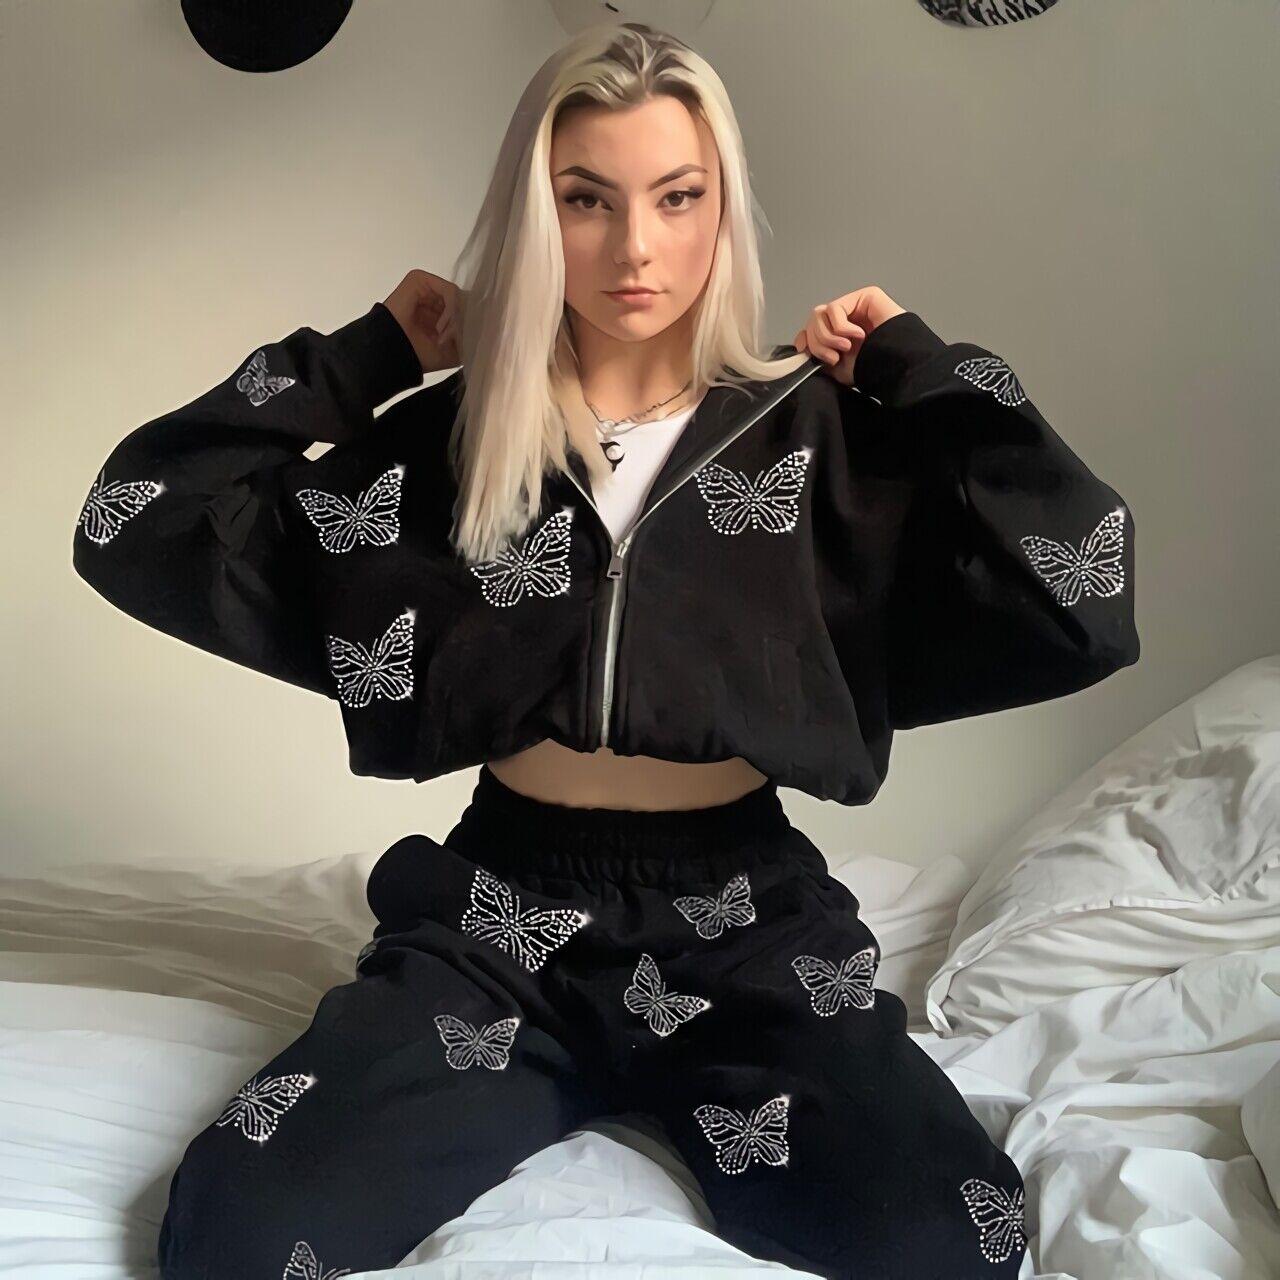 Damen Lose Schmetterling Reißverschluss Kapuzenpullover Hosenanzug Casual Sports